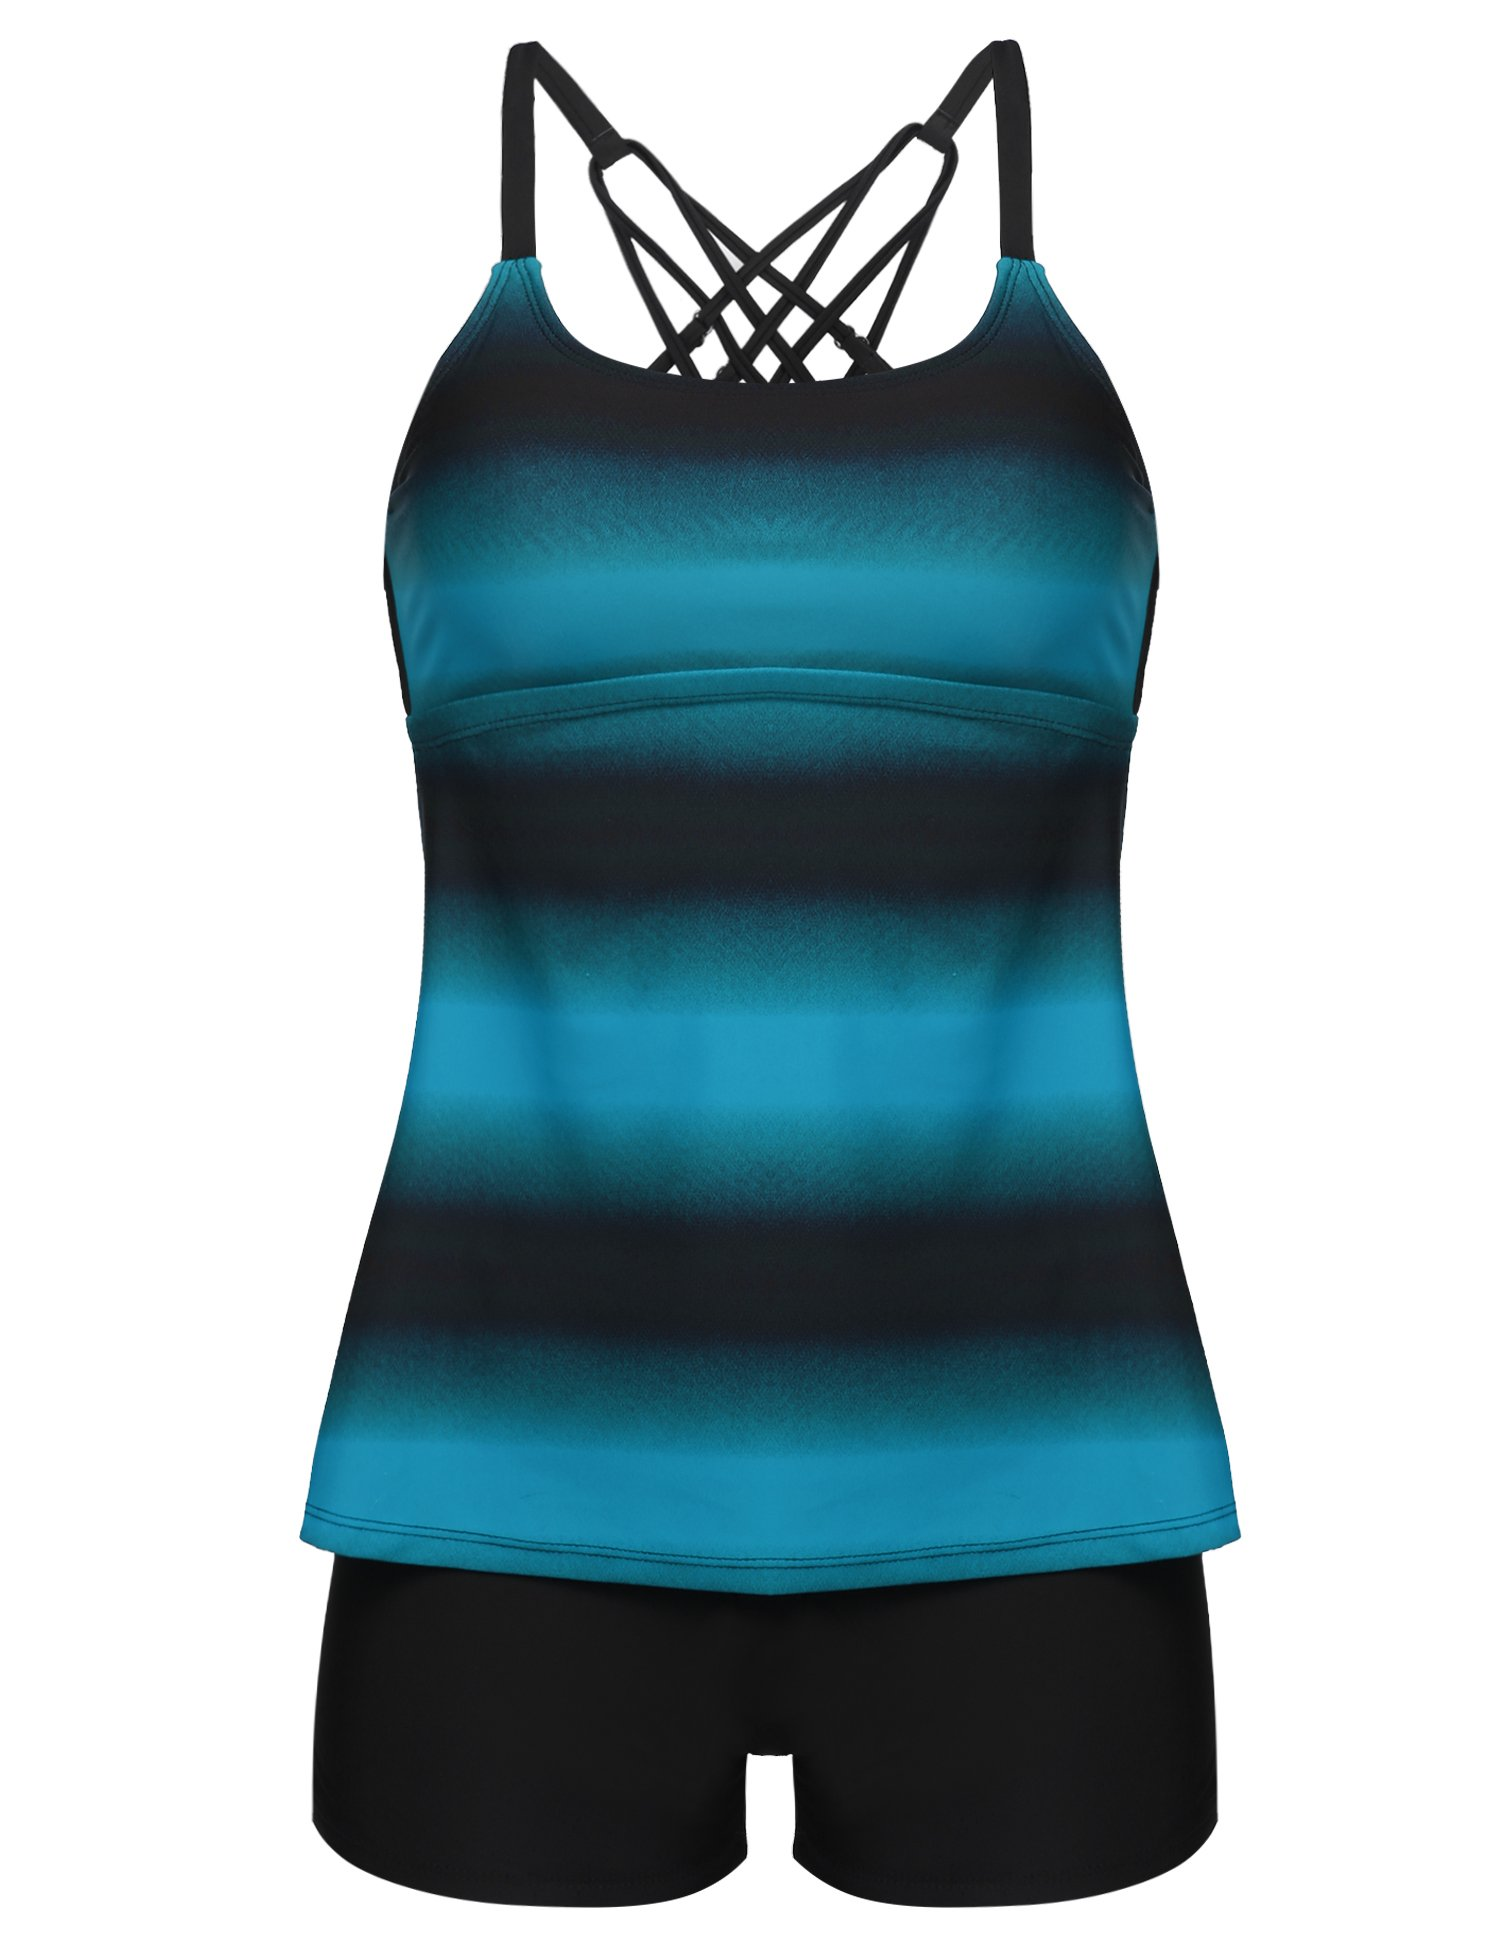 LAZOSAL Womens Swimsuit Criss Cross Tankini Boyshort Color Block Two Piece Bathing Suit S-XXXXL